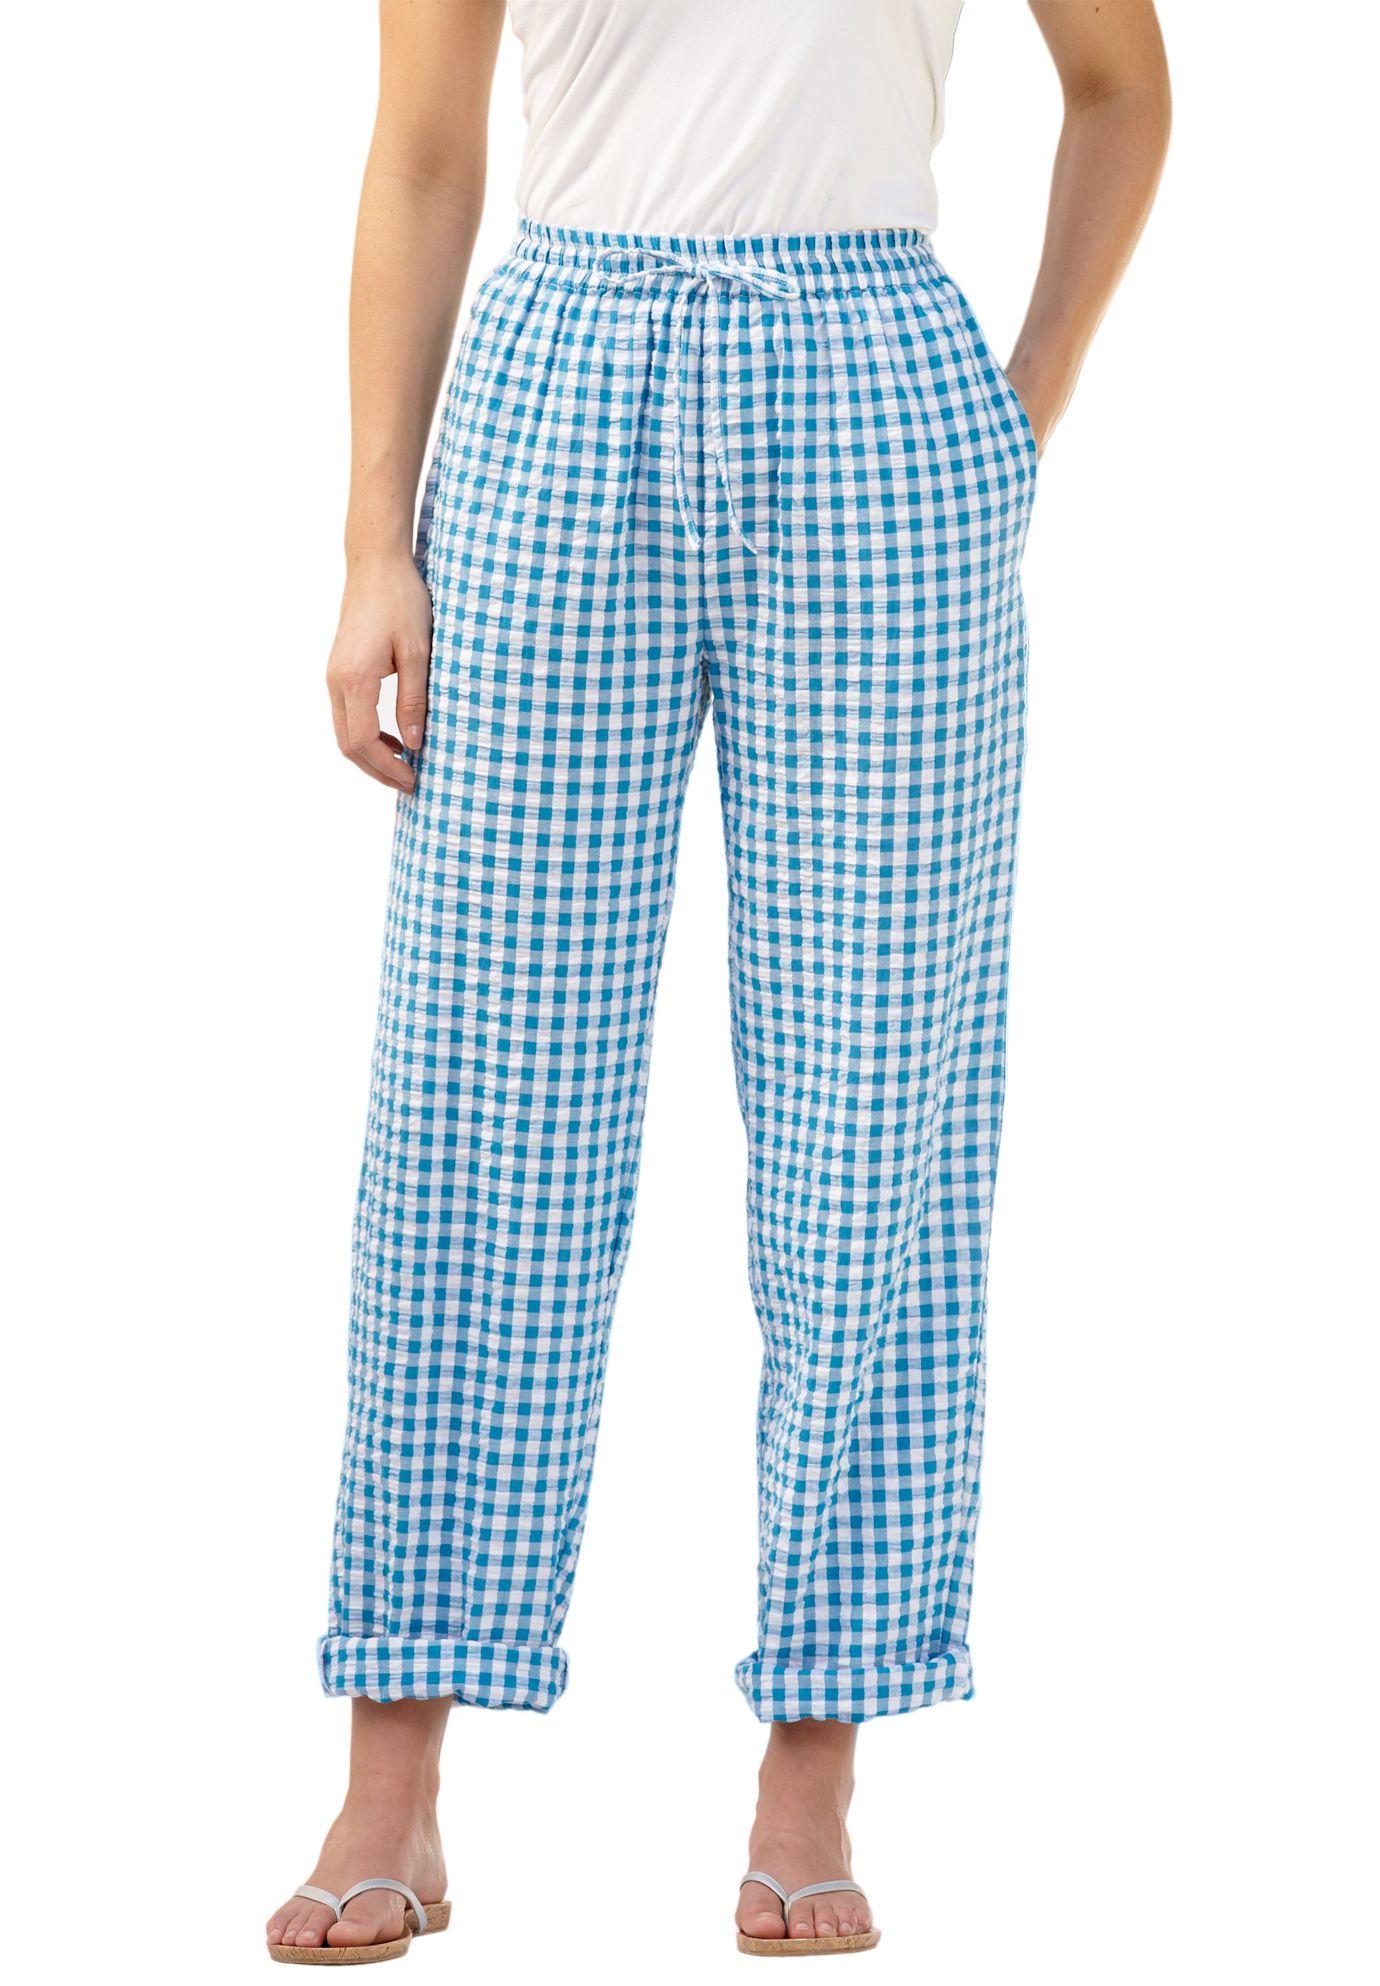 Seersucker Pants With Drawstring Trim Plus Size All Pants